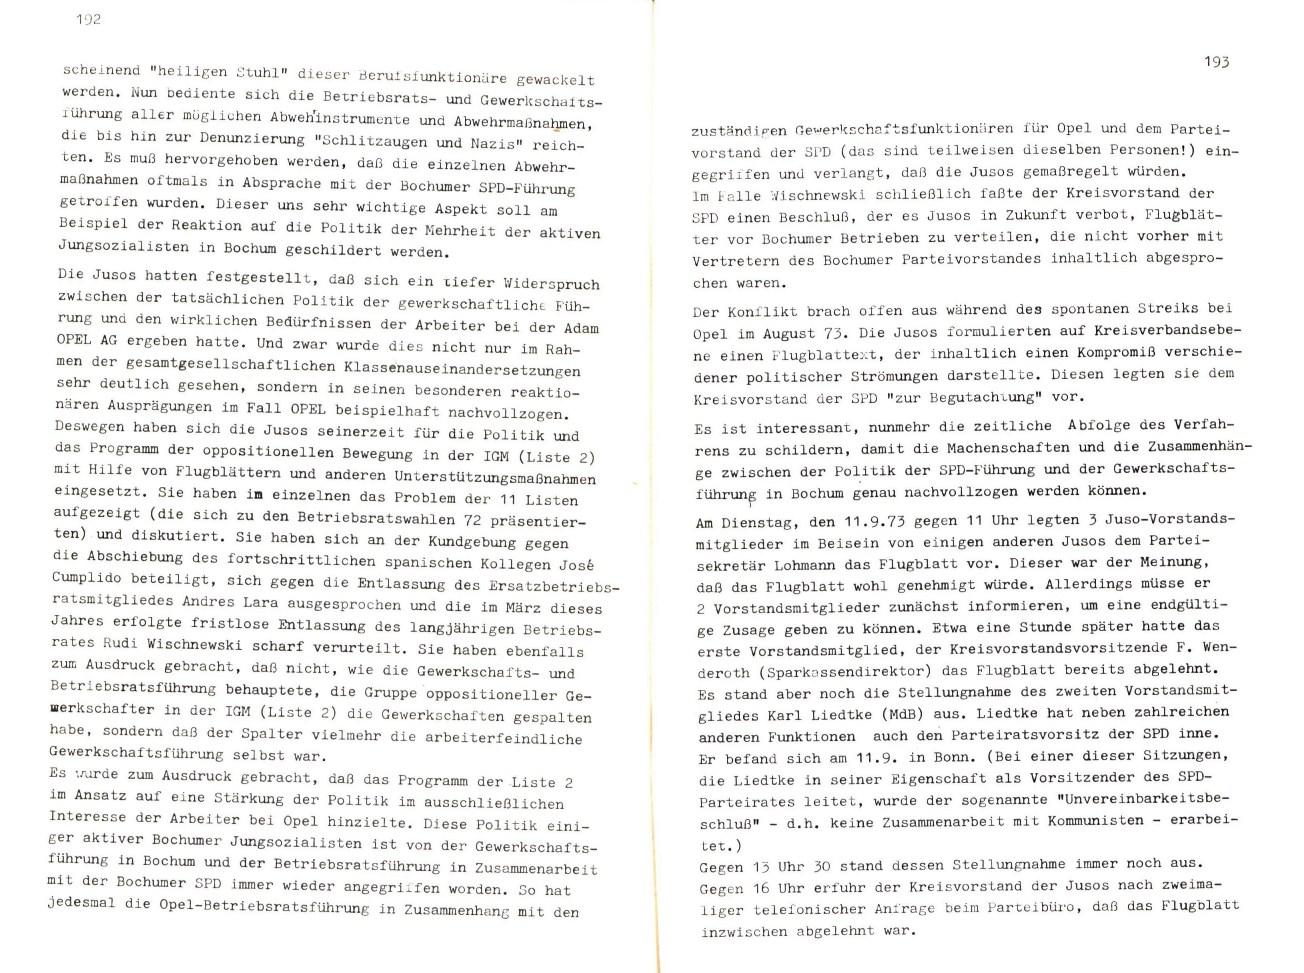 Bochum_IGM_Opel_PG_Opel_streikt_1973_099